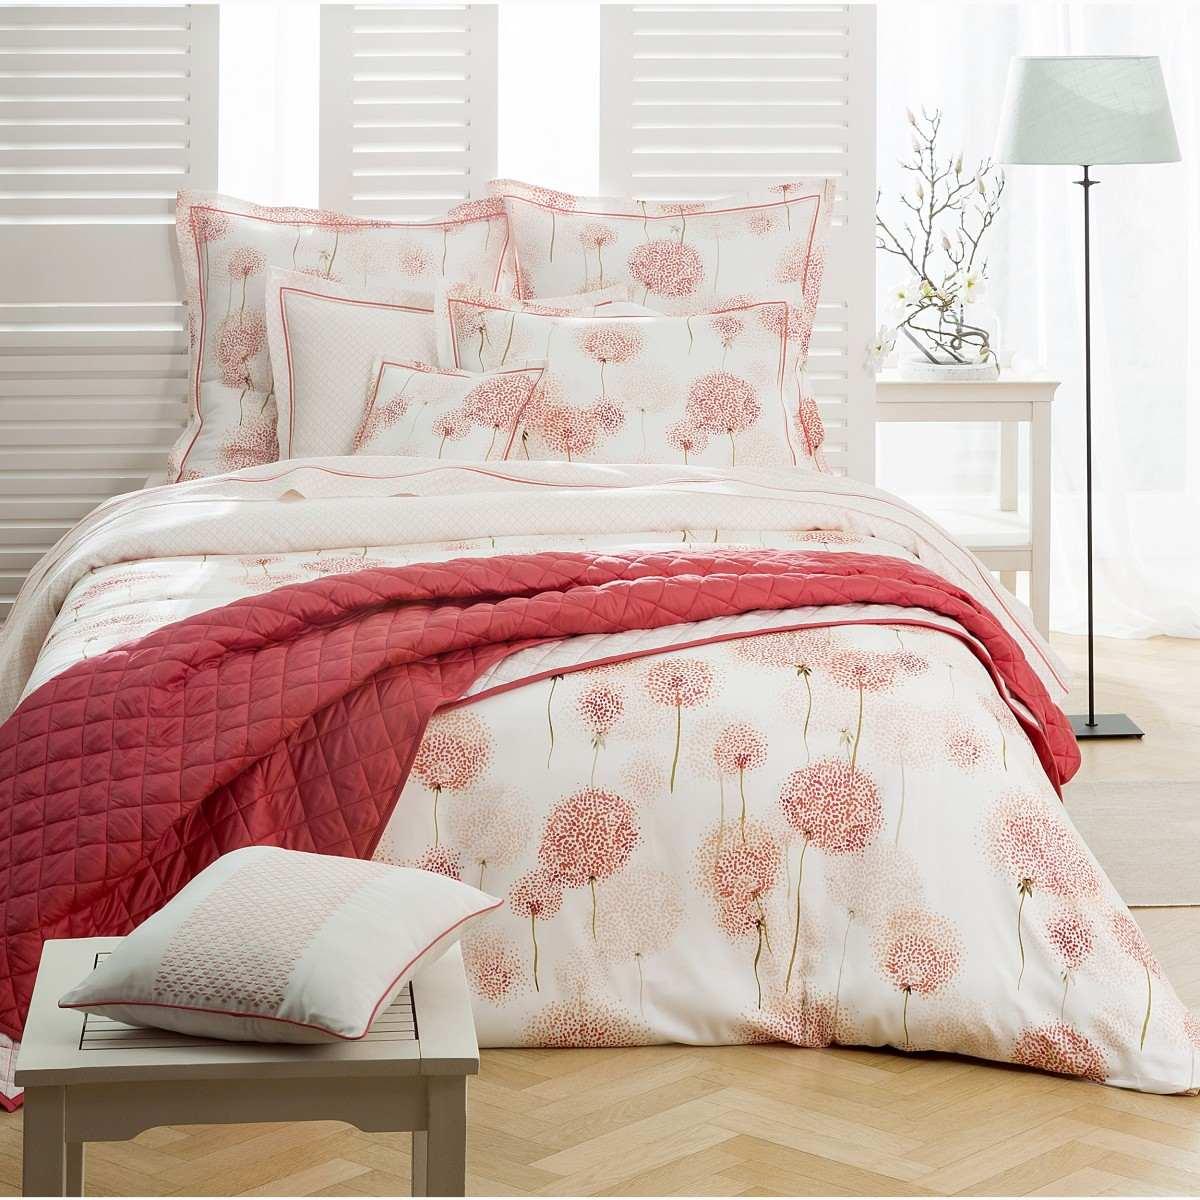 parure evanescence soldes jusqu 39 55 linge de lit de qualit tradition des vosges. Black Bedroom Furniture Sets. Home Design Ideas